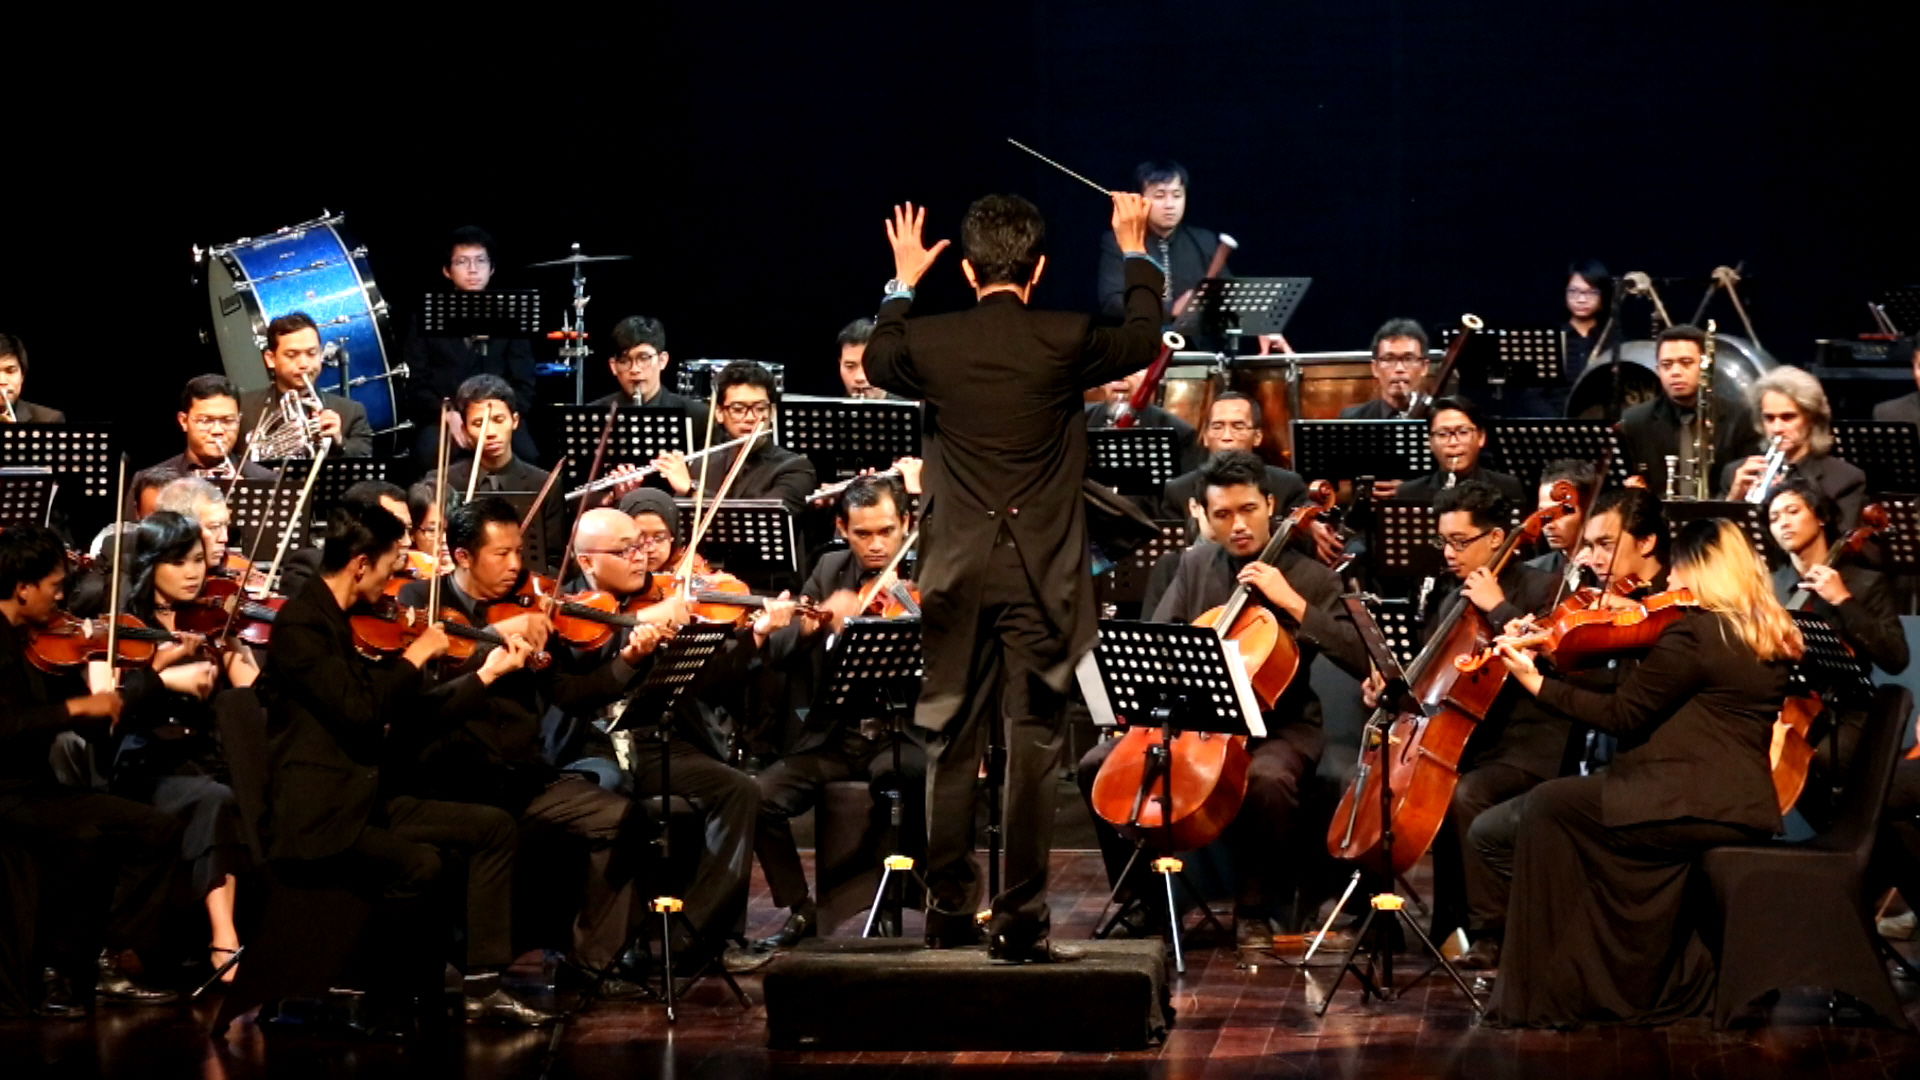 Orkes itu dimainkan oleh 56 pemusik terpilih yang sudah menjalankan audisi di Jakarta dan Yogyakarta. Mereka rata-rata masih berusia 20-an dan tampil dalam dua babak yang masing-masing berdurasi 40 menit.